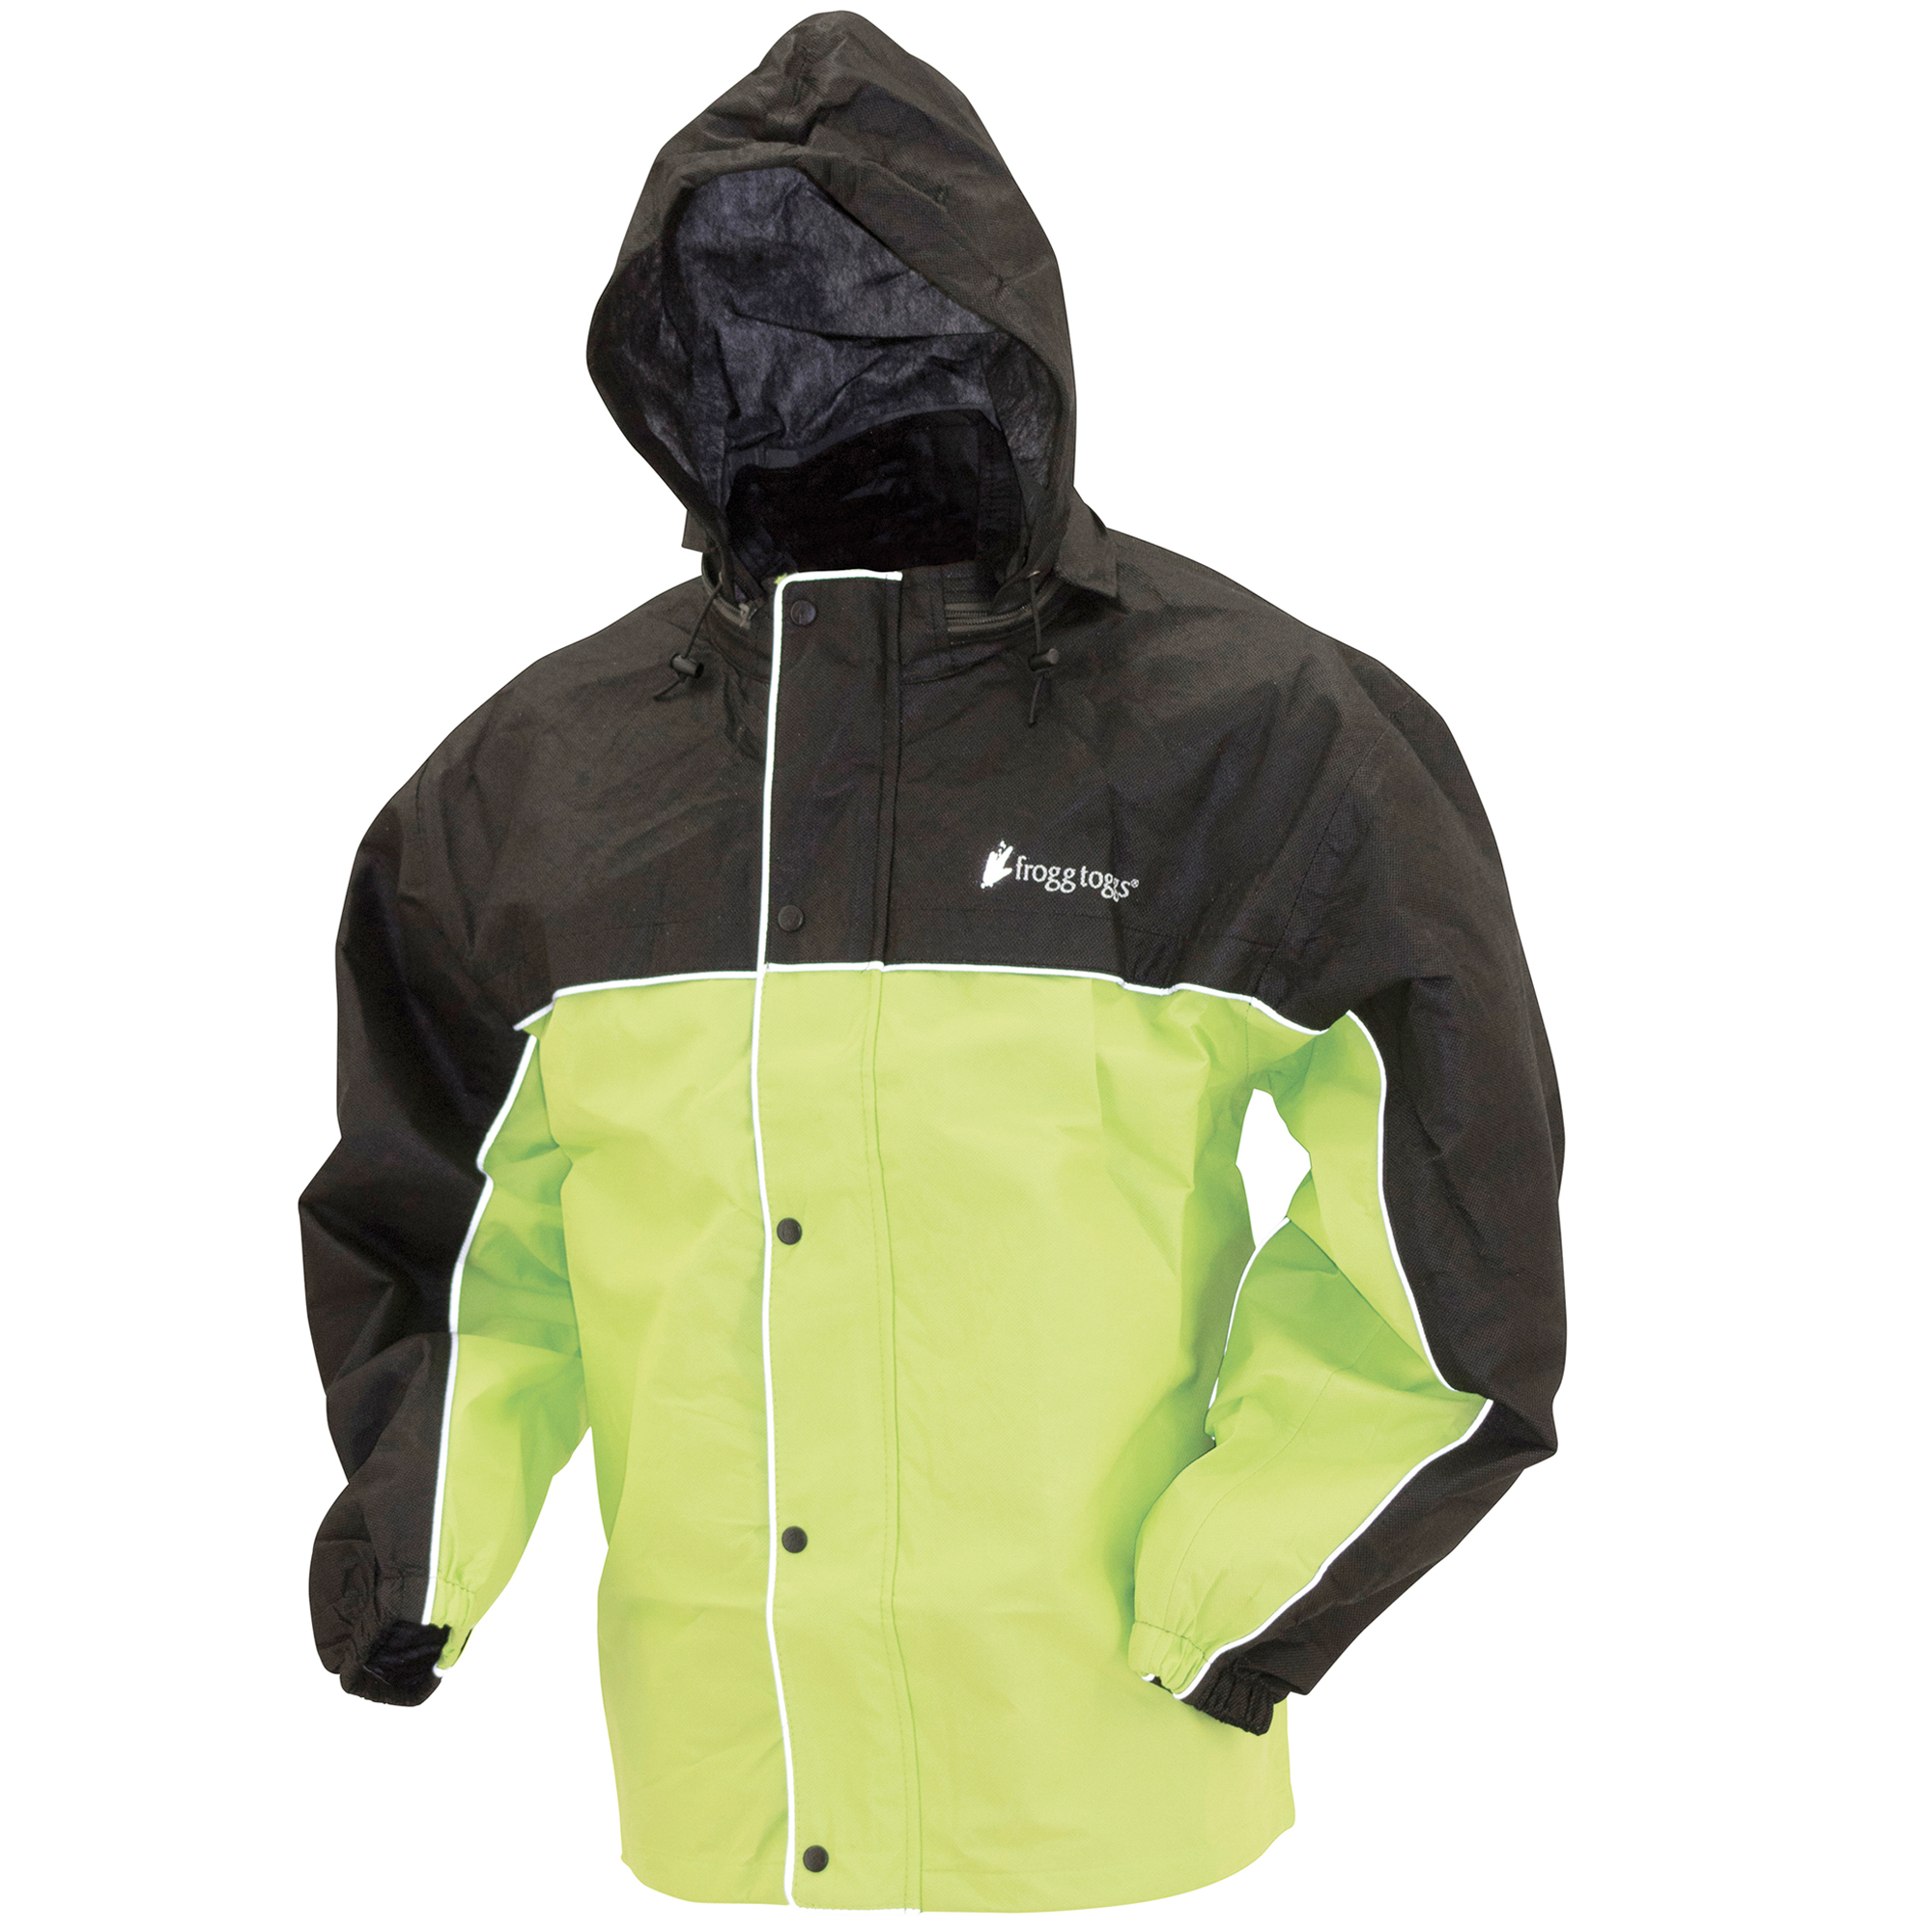 Frogg Toggs Mens Road Toad Black Rain Jacket FT63133-01-3XL